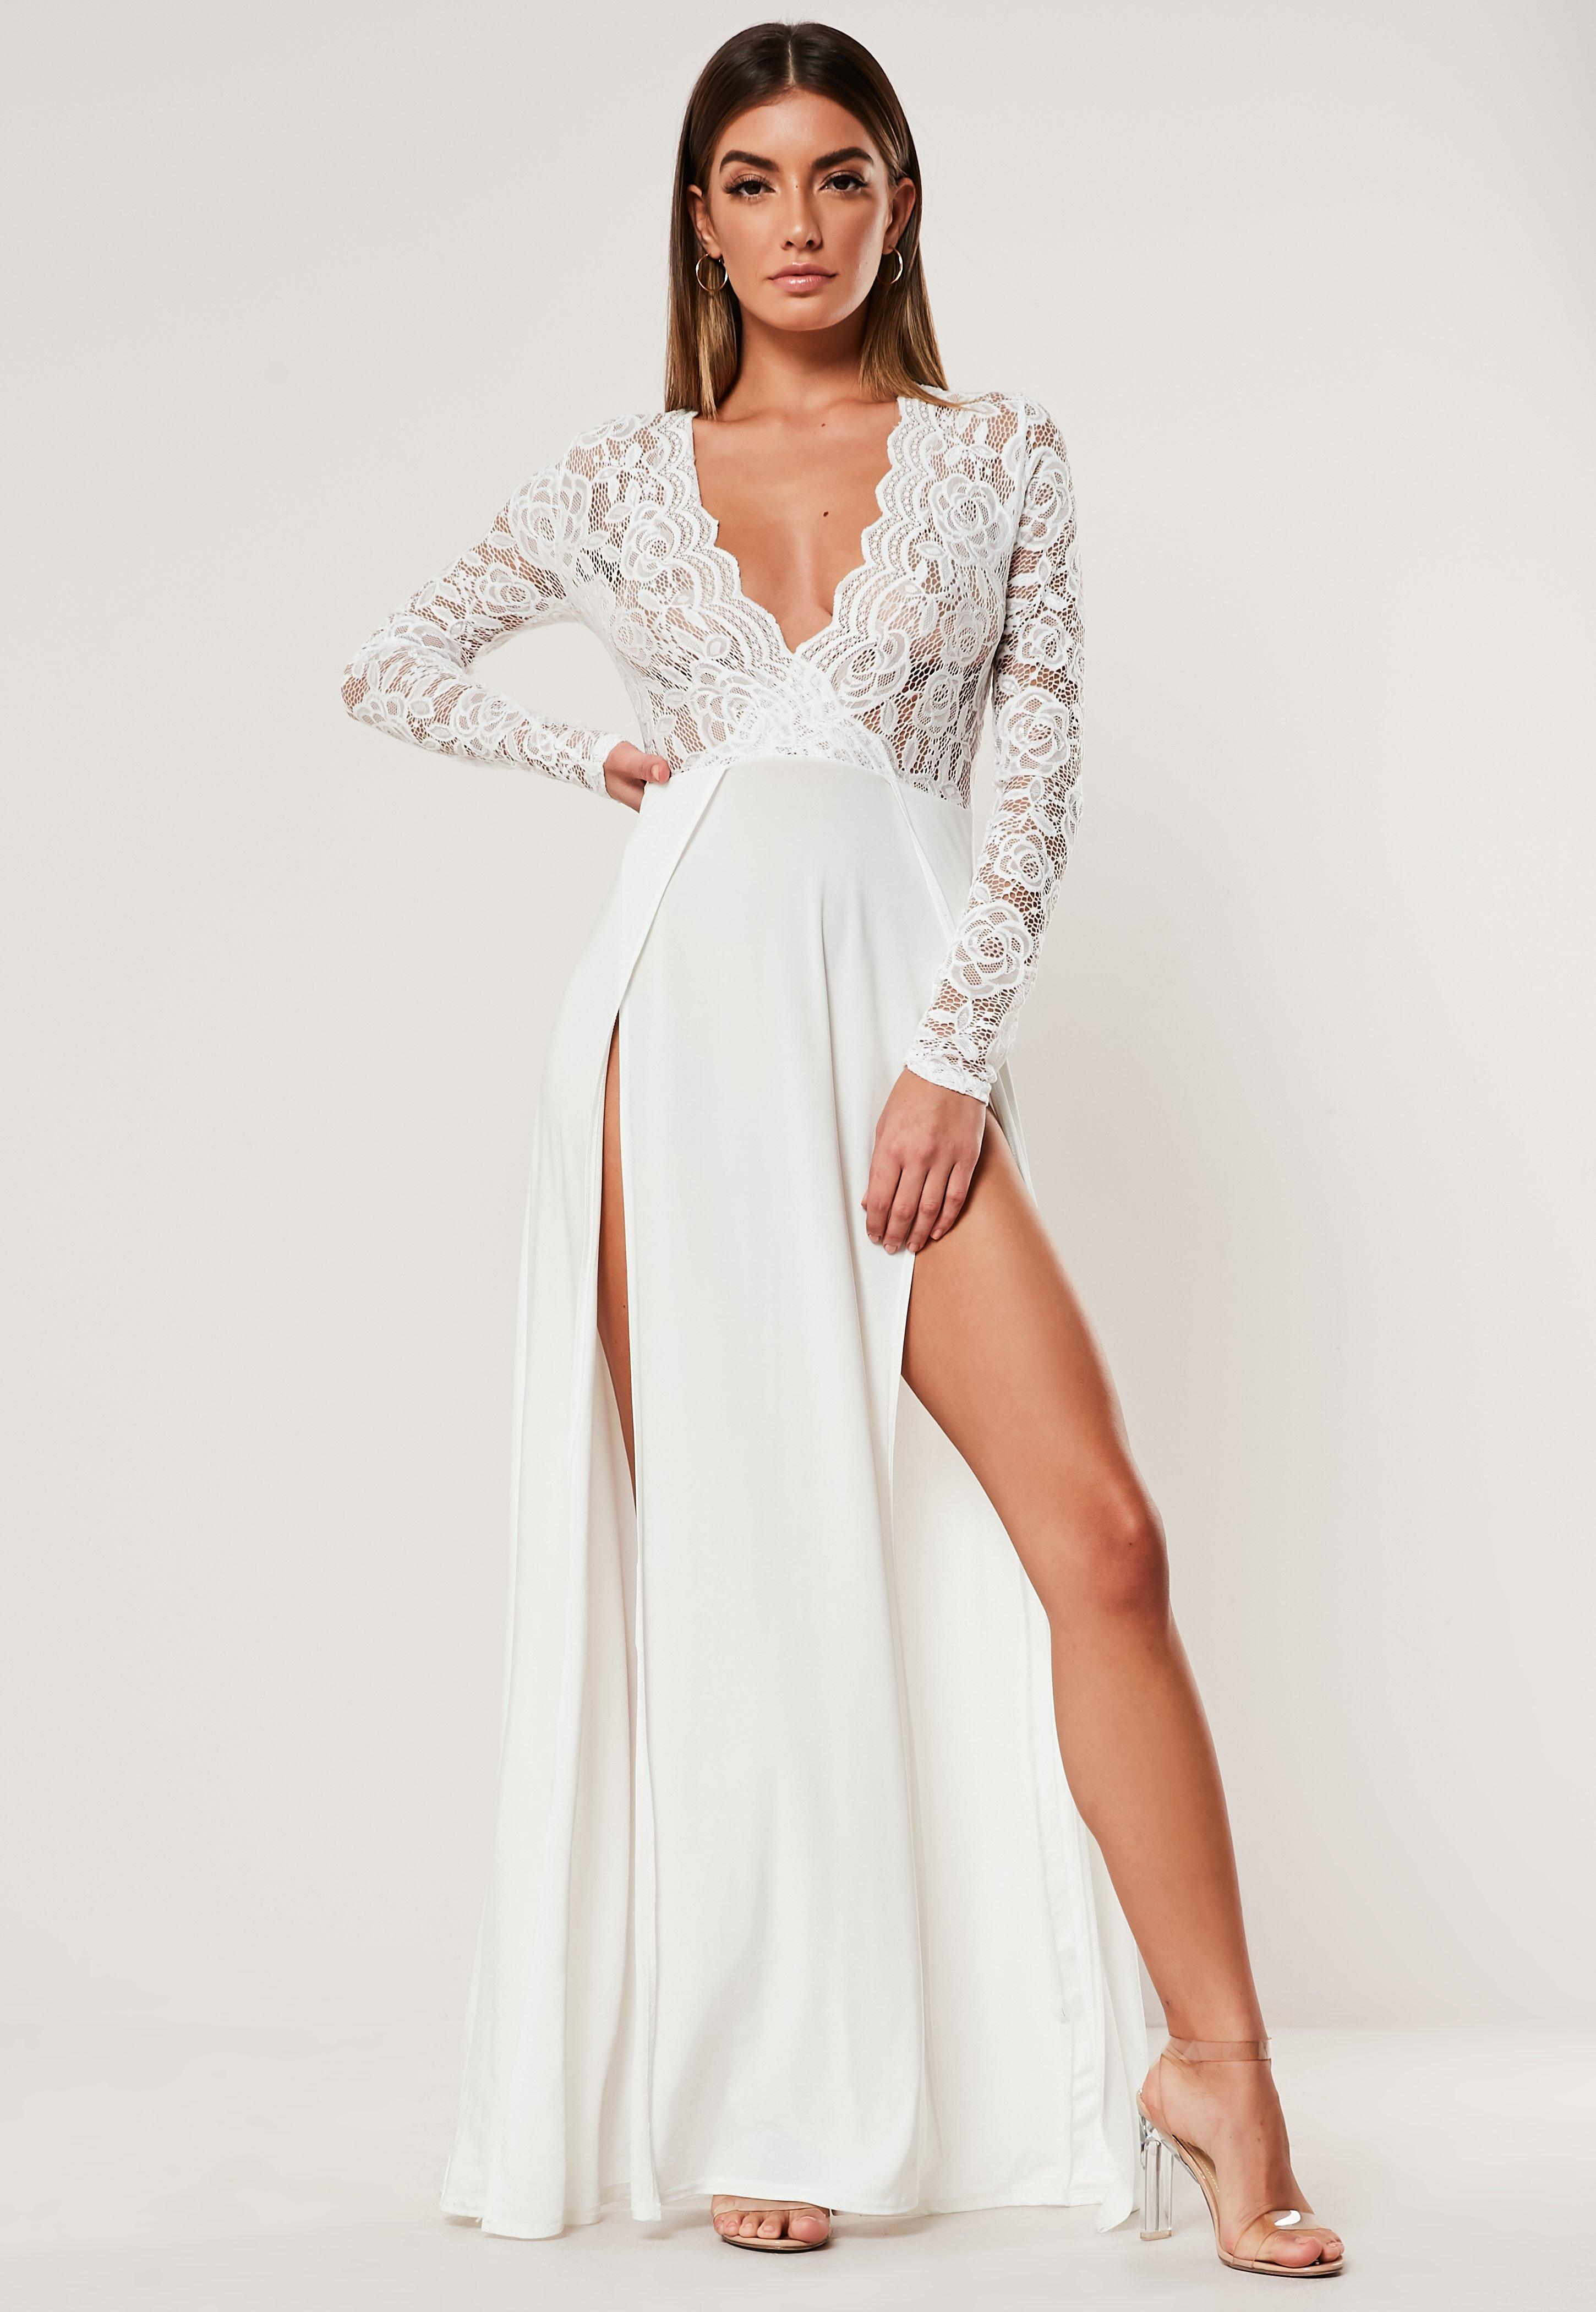 aa0d5177 Wrap Dresses | Wrap dress & Tie Waist Dresses - Missguided